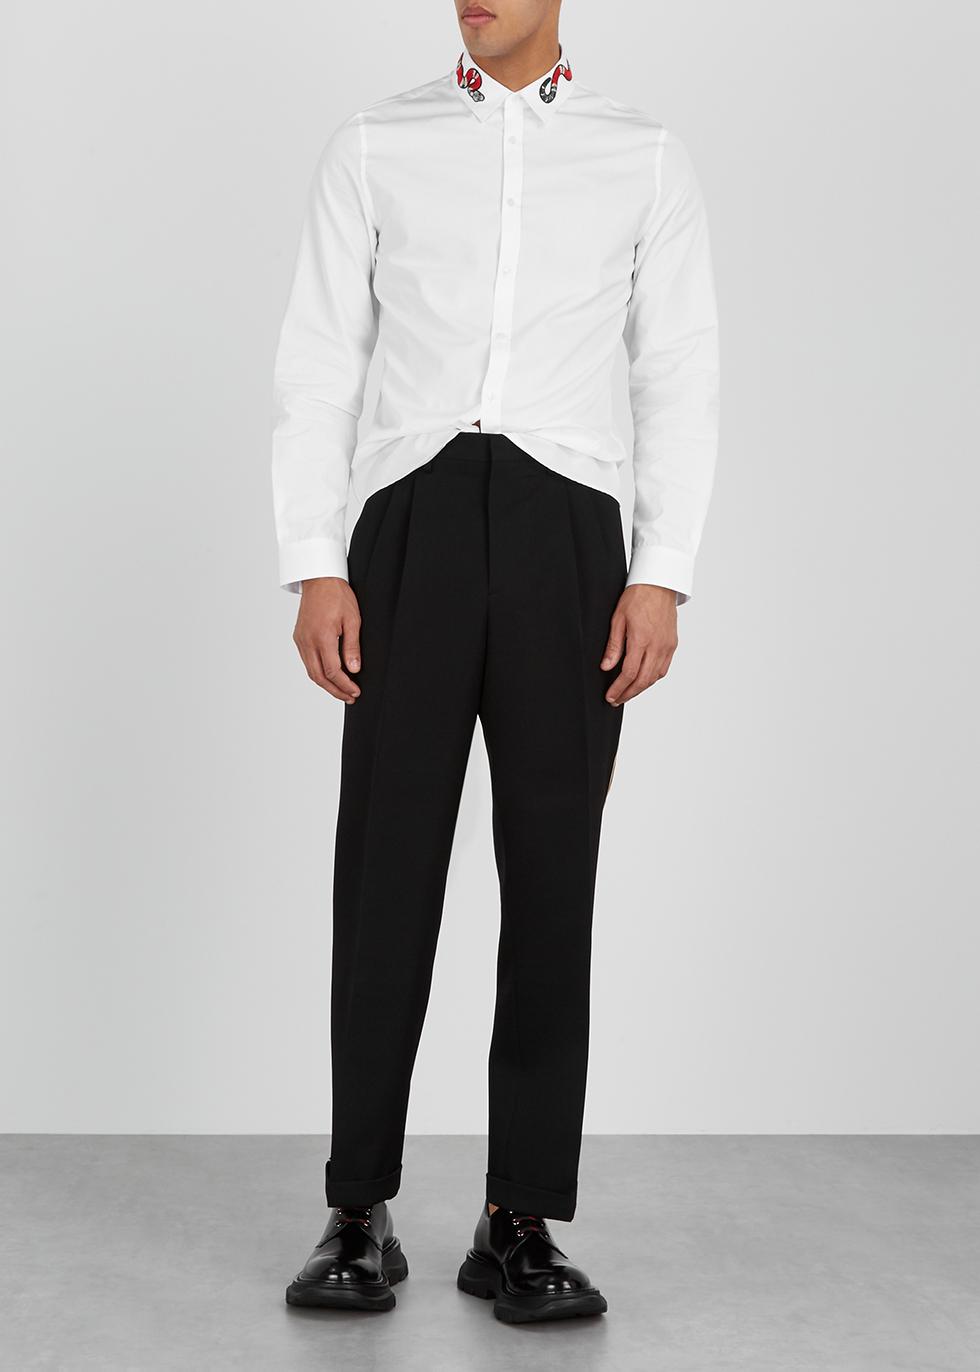 Mens Designer Clothes Birmingham | Men S Designer Clothing Shoes And Bags Harvey Nichols